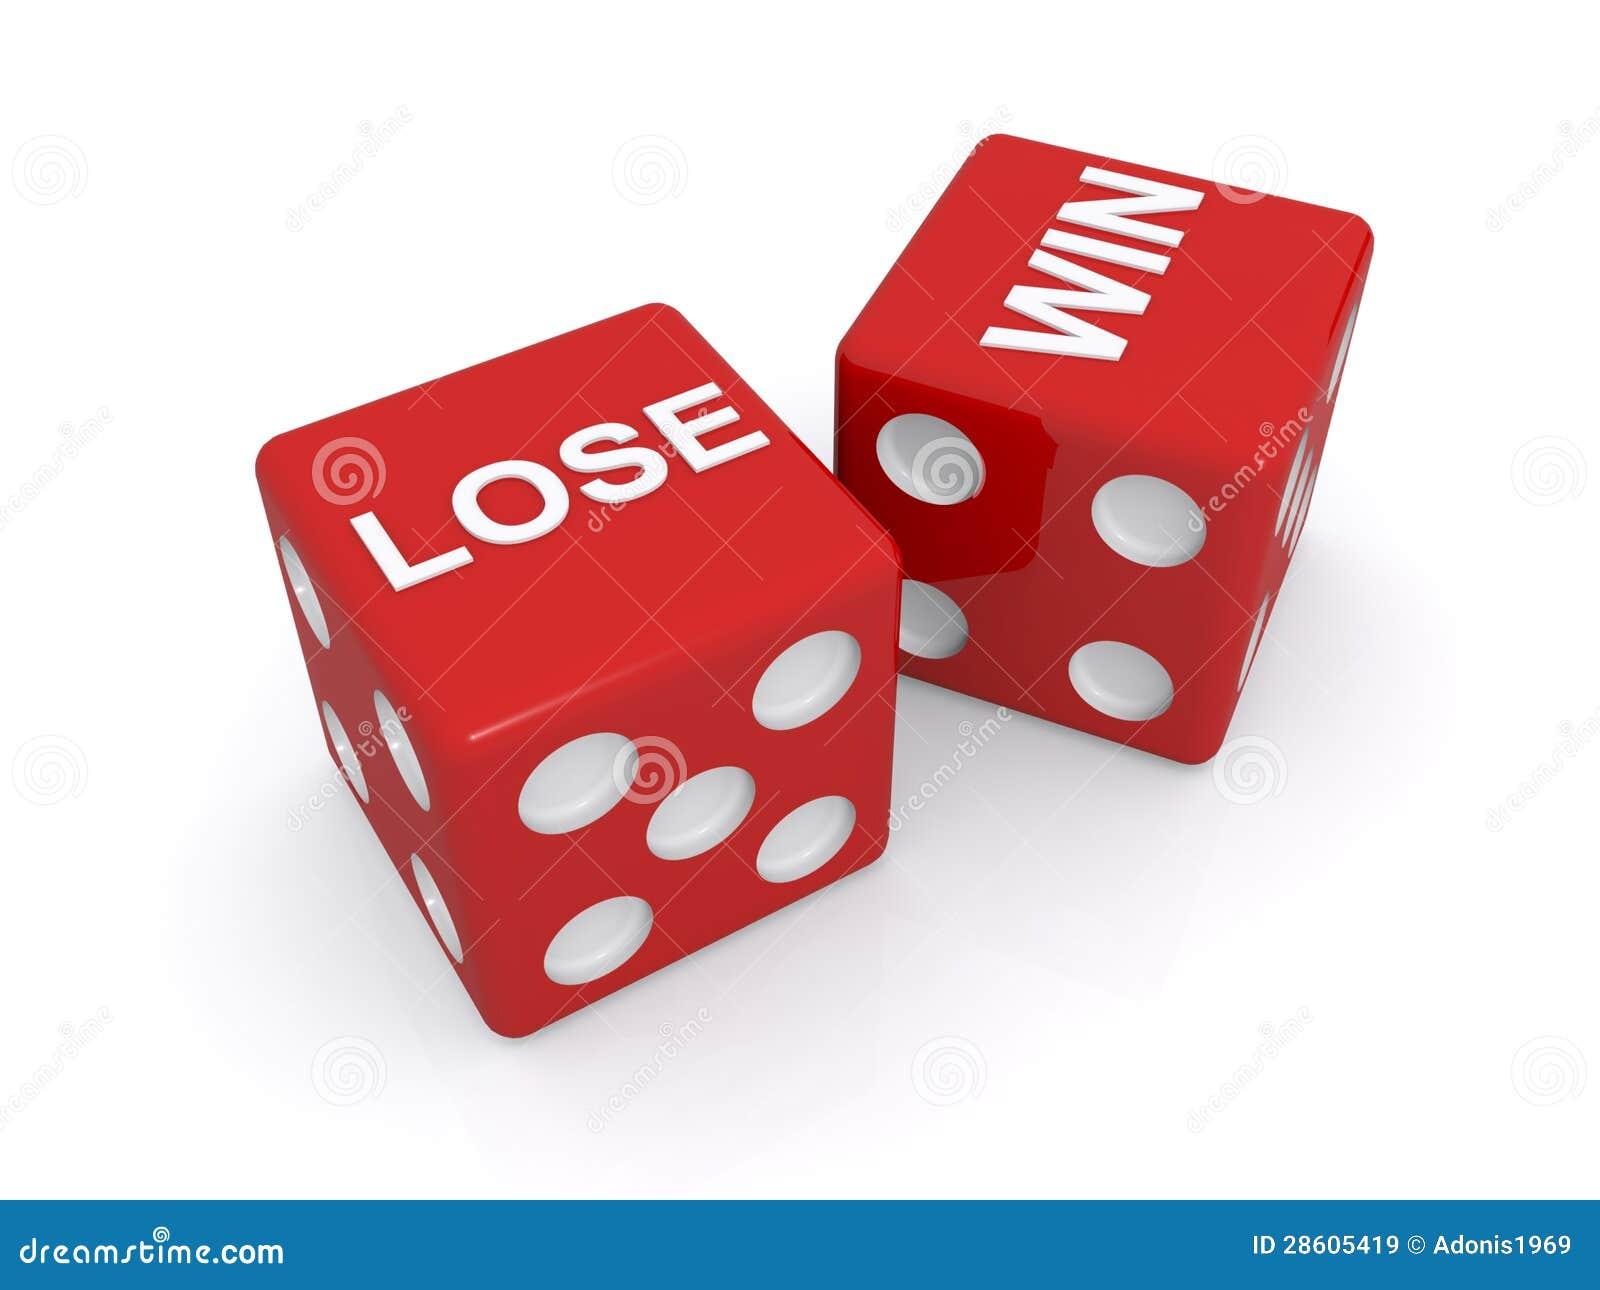 lose it Buy lose it: read 2548 apps & games reviews - amazoncom.